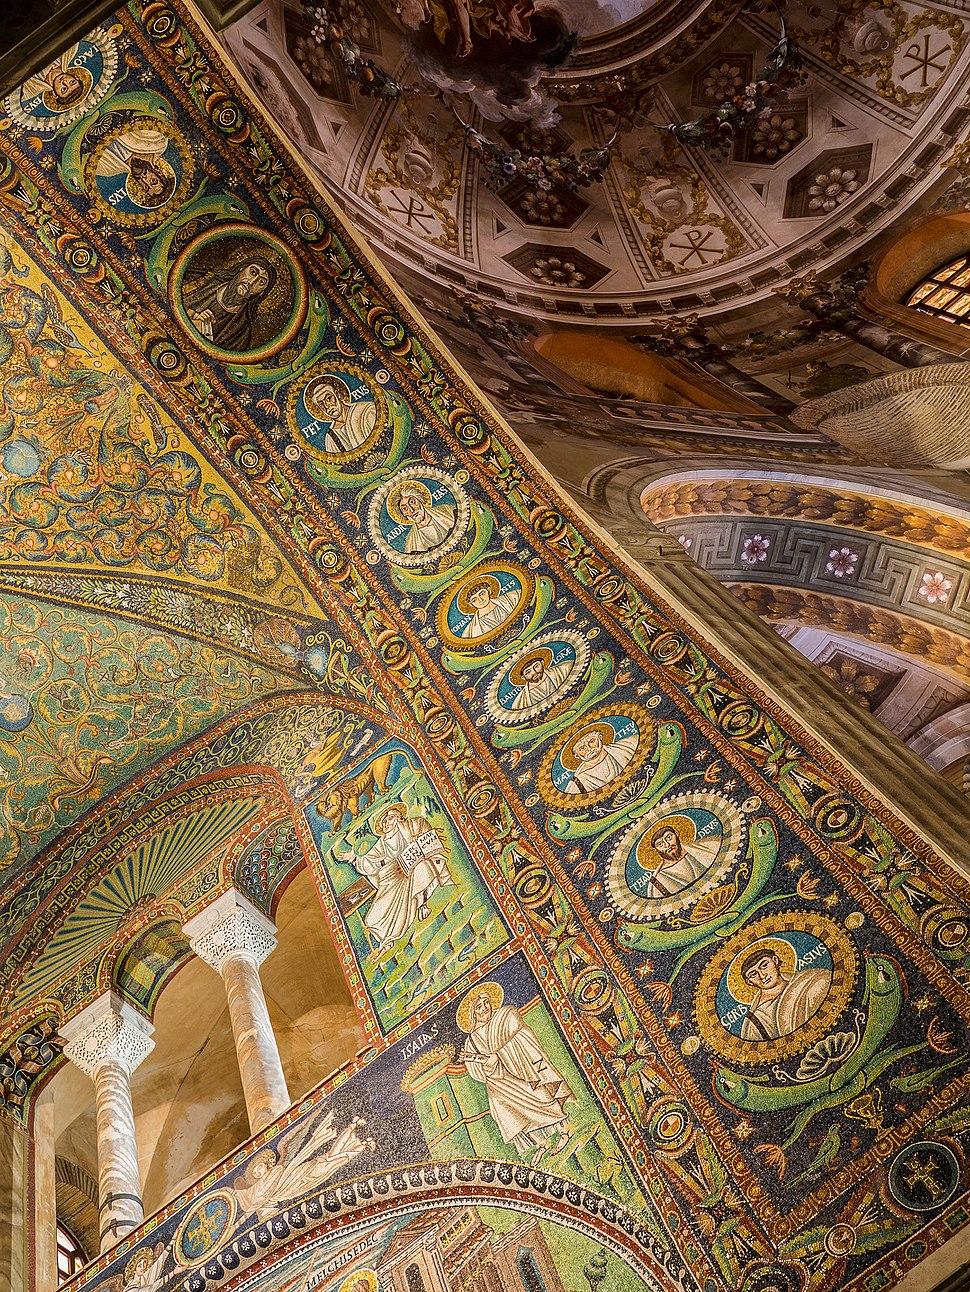 Basilica of San Vitale - triumphal arch mosaics